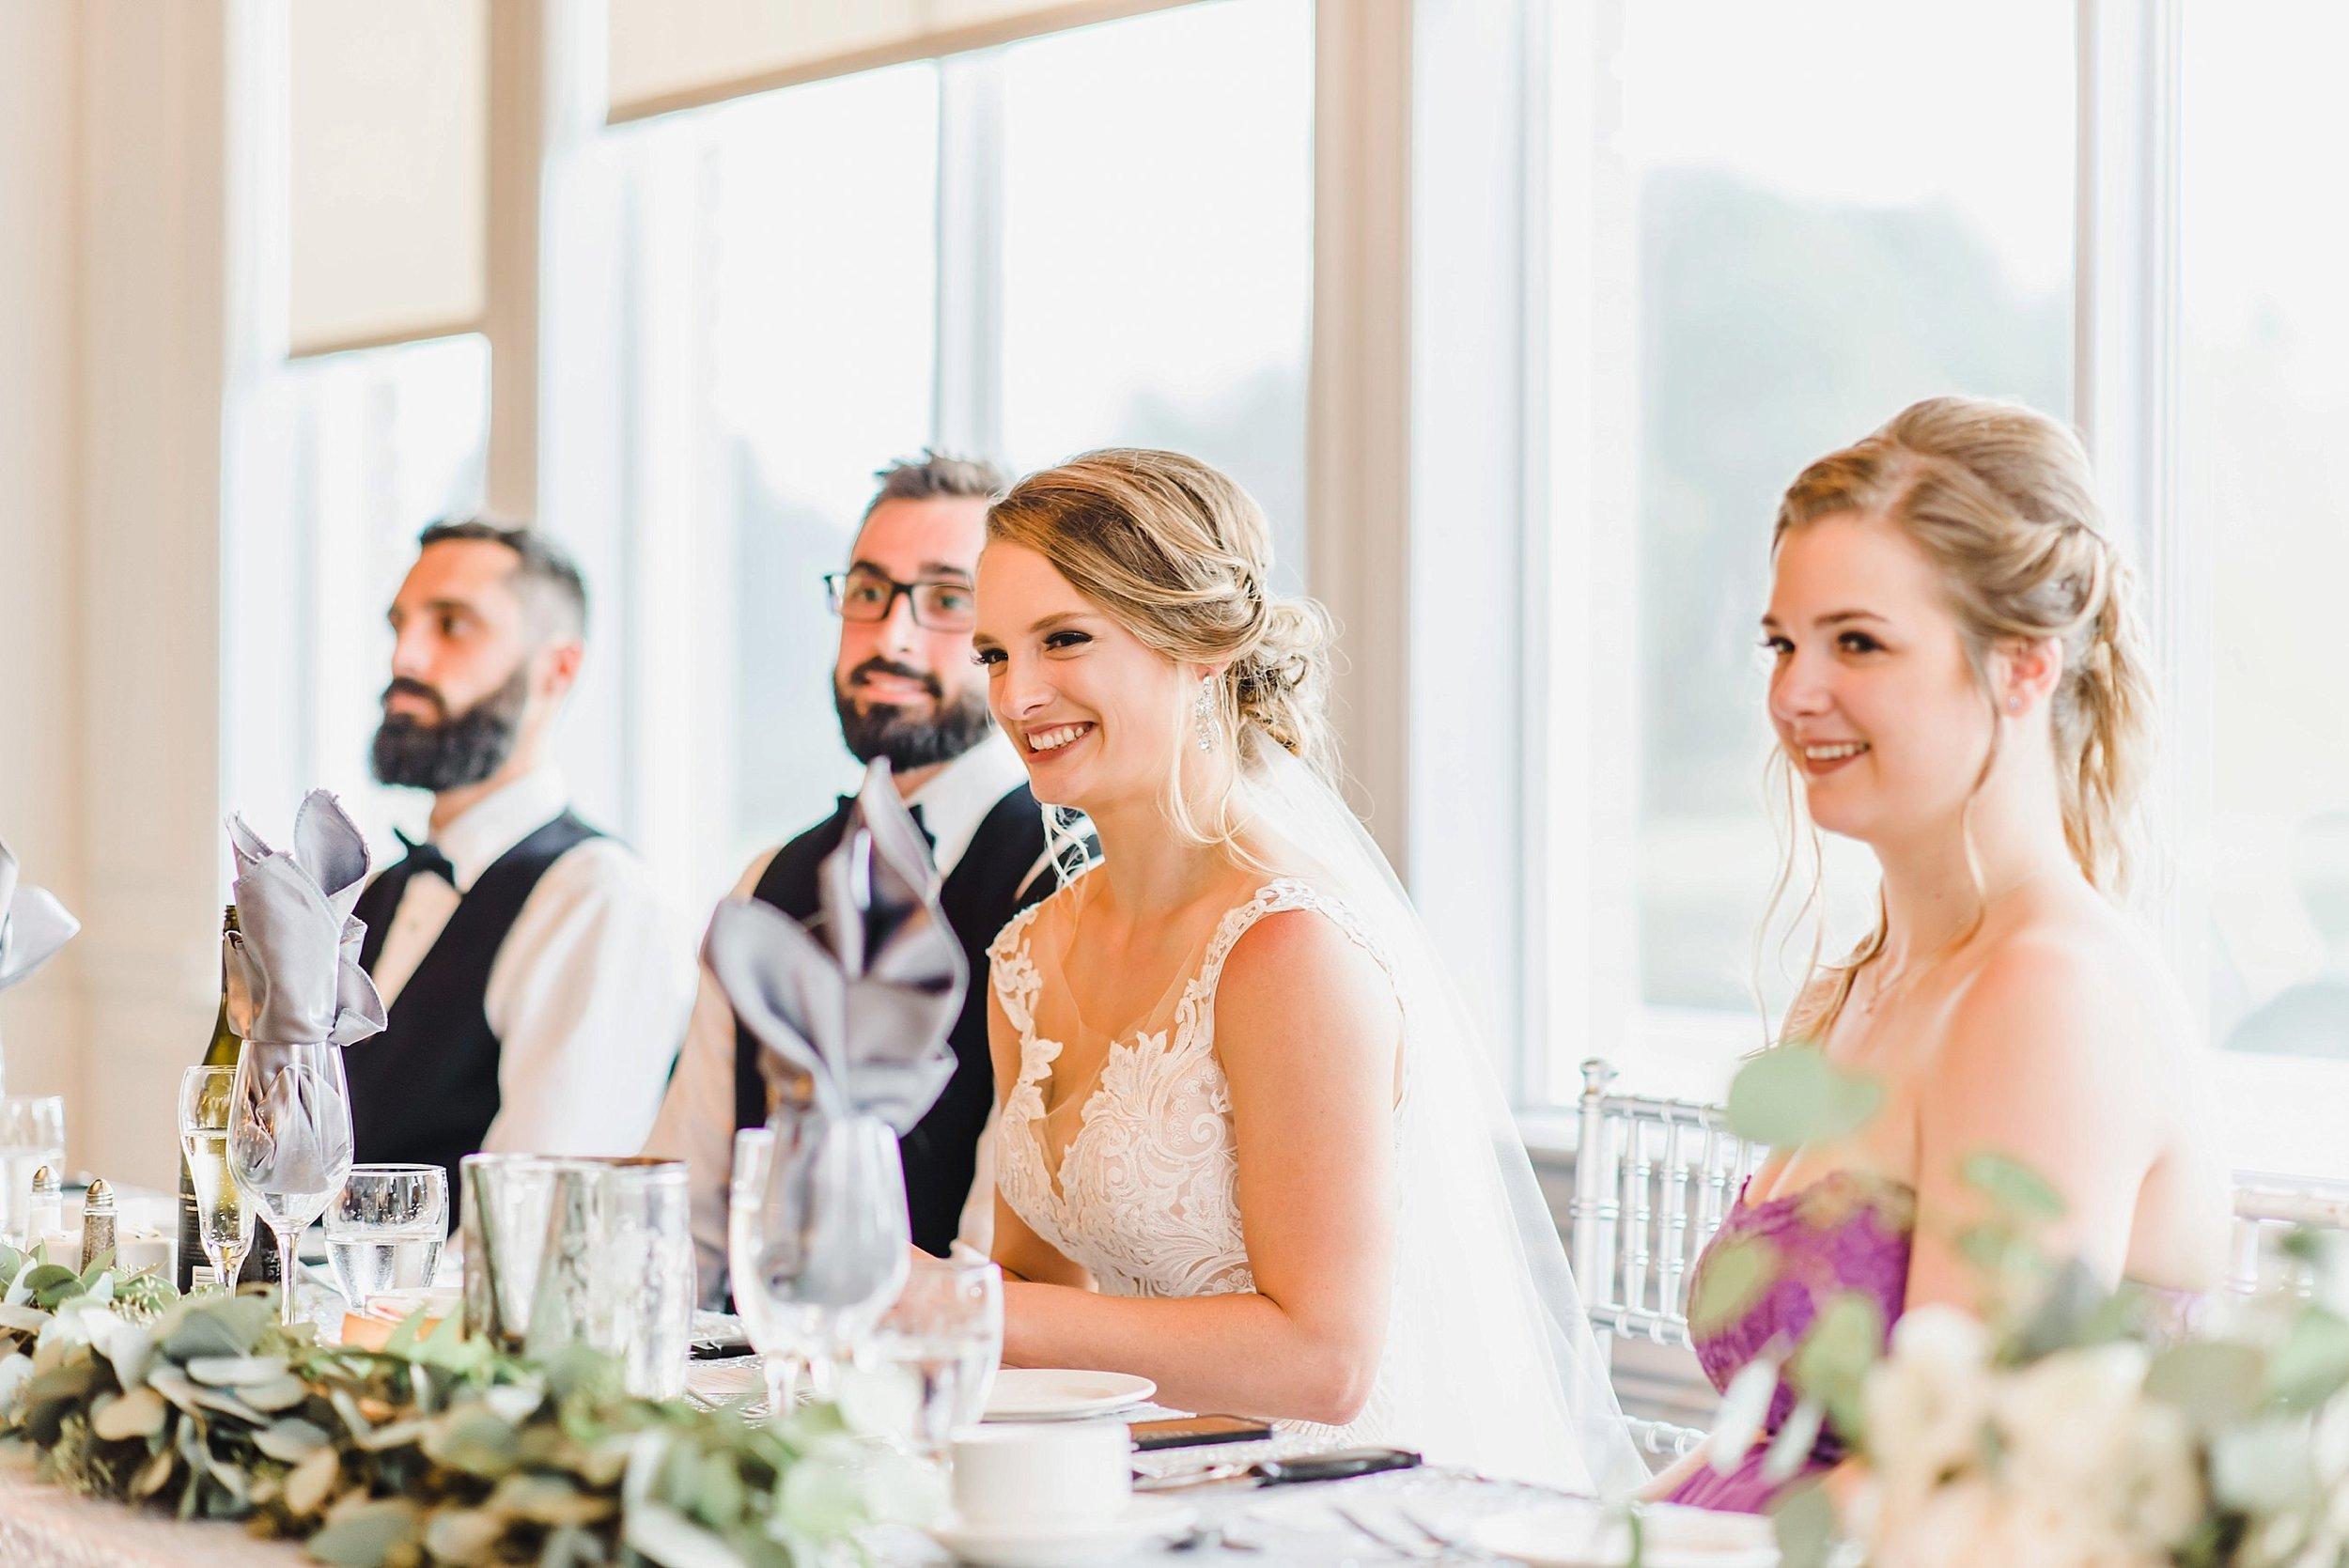 light airy indie fine art ottawa wedding photographer | Ali and Batoul Photography_1339.jpg